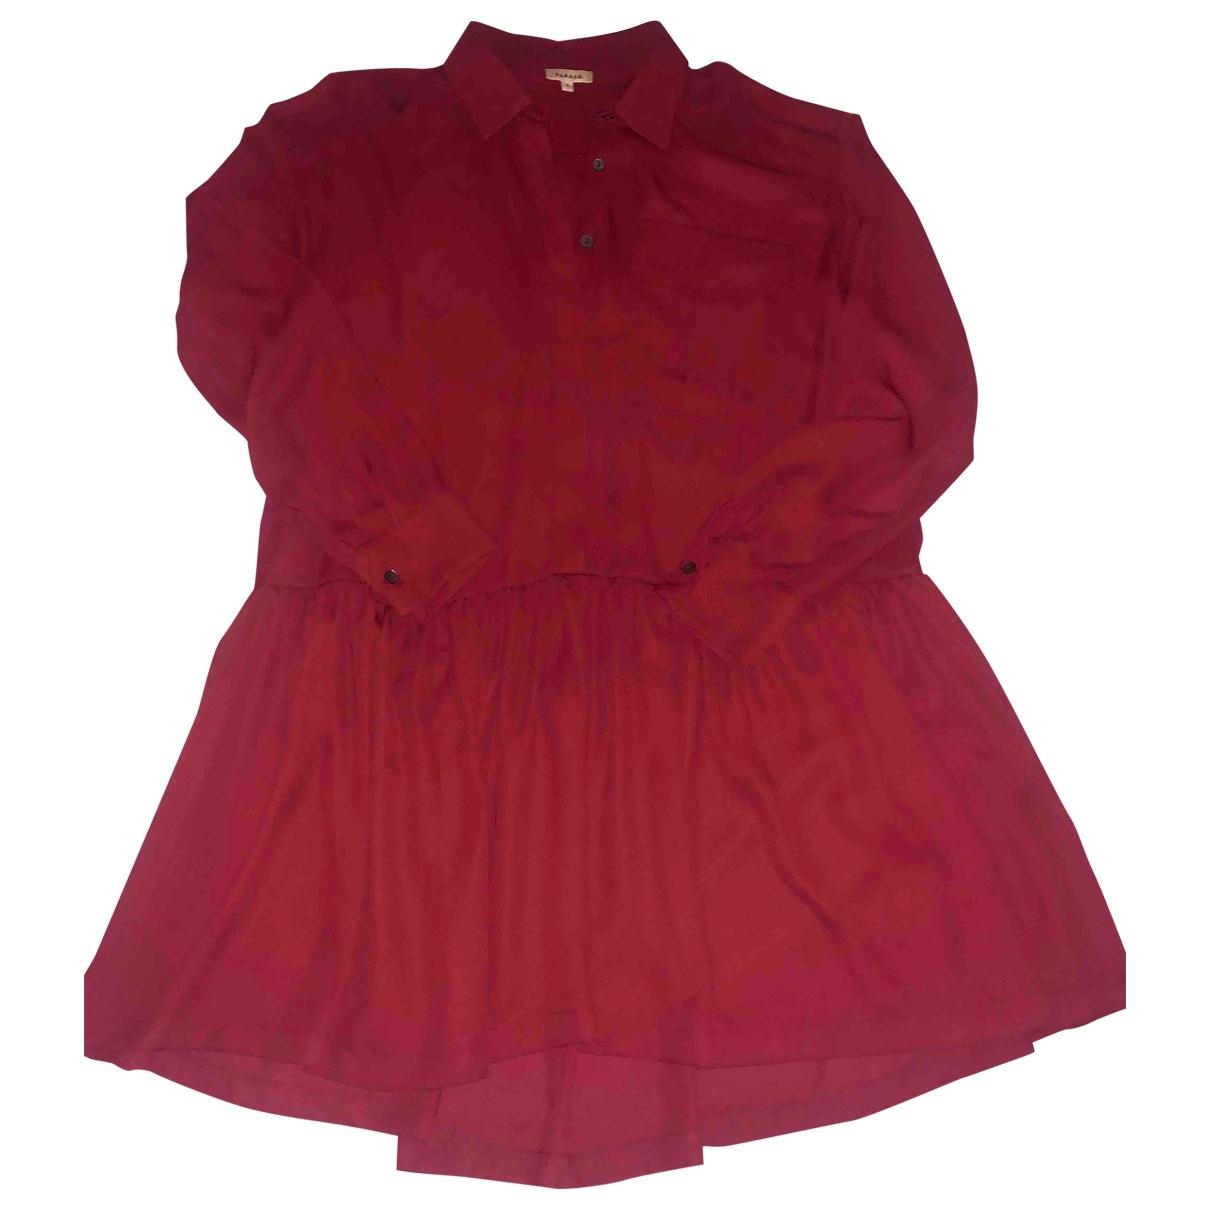 Parosh \N Kleid in  Bordeauxrot Polyester